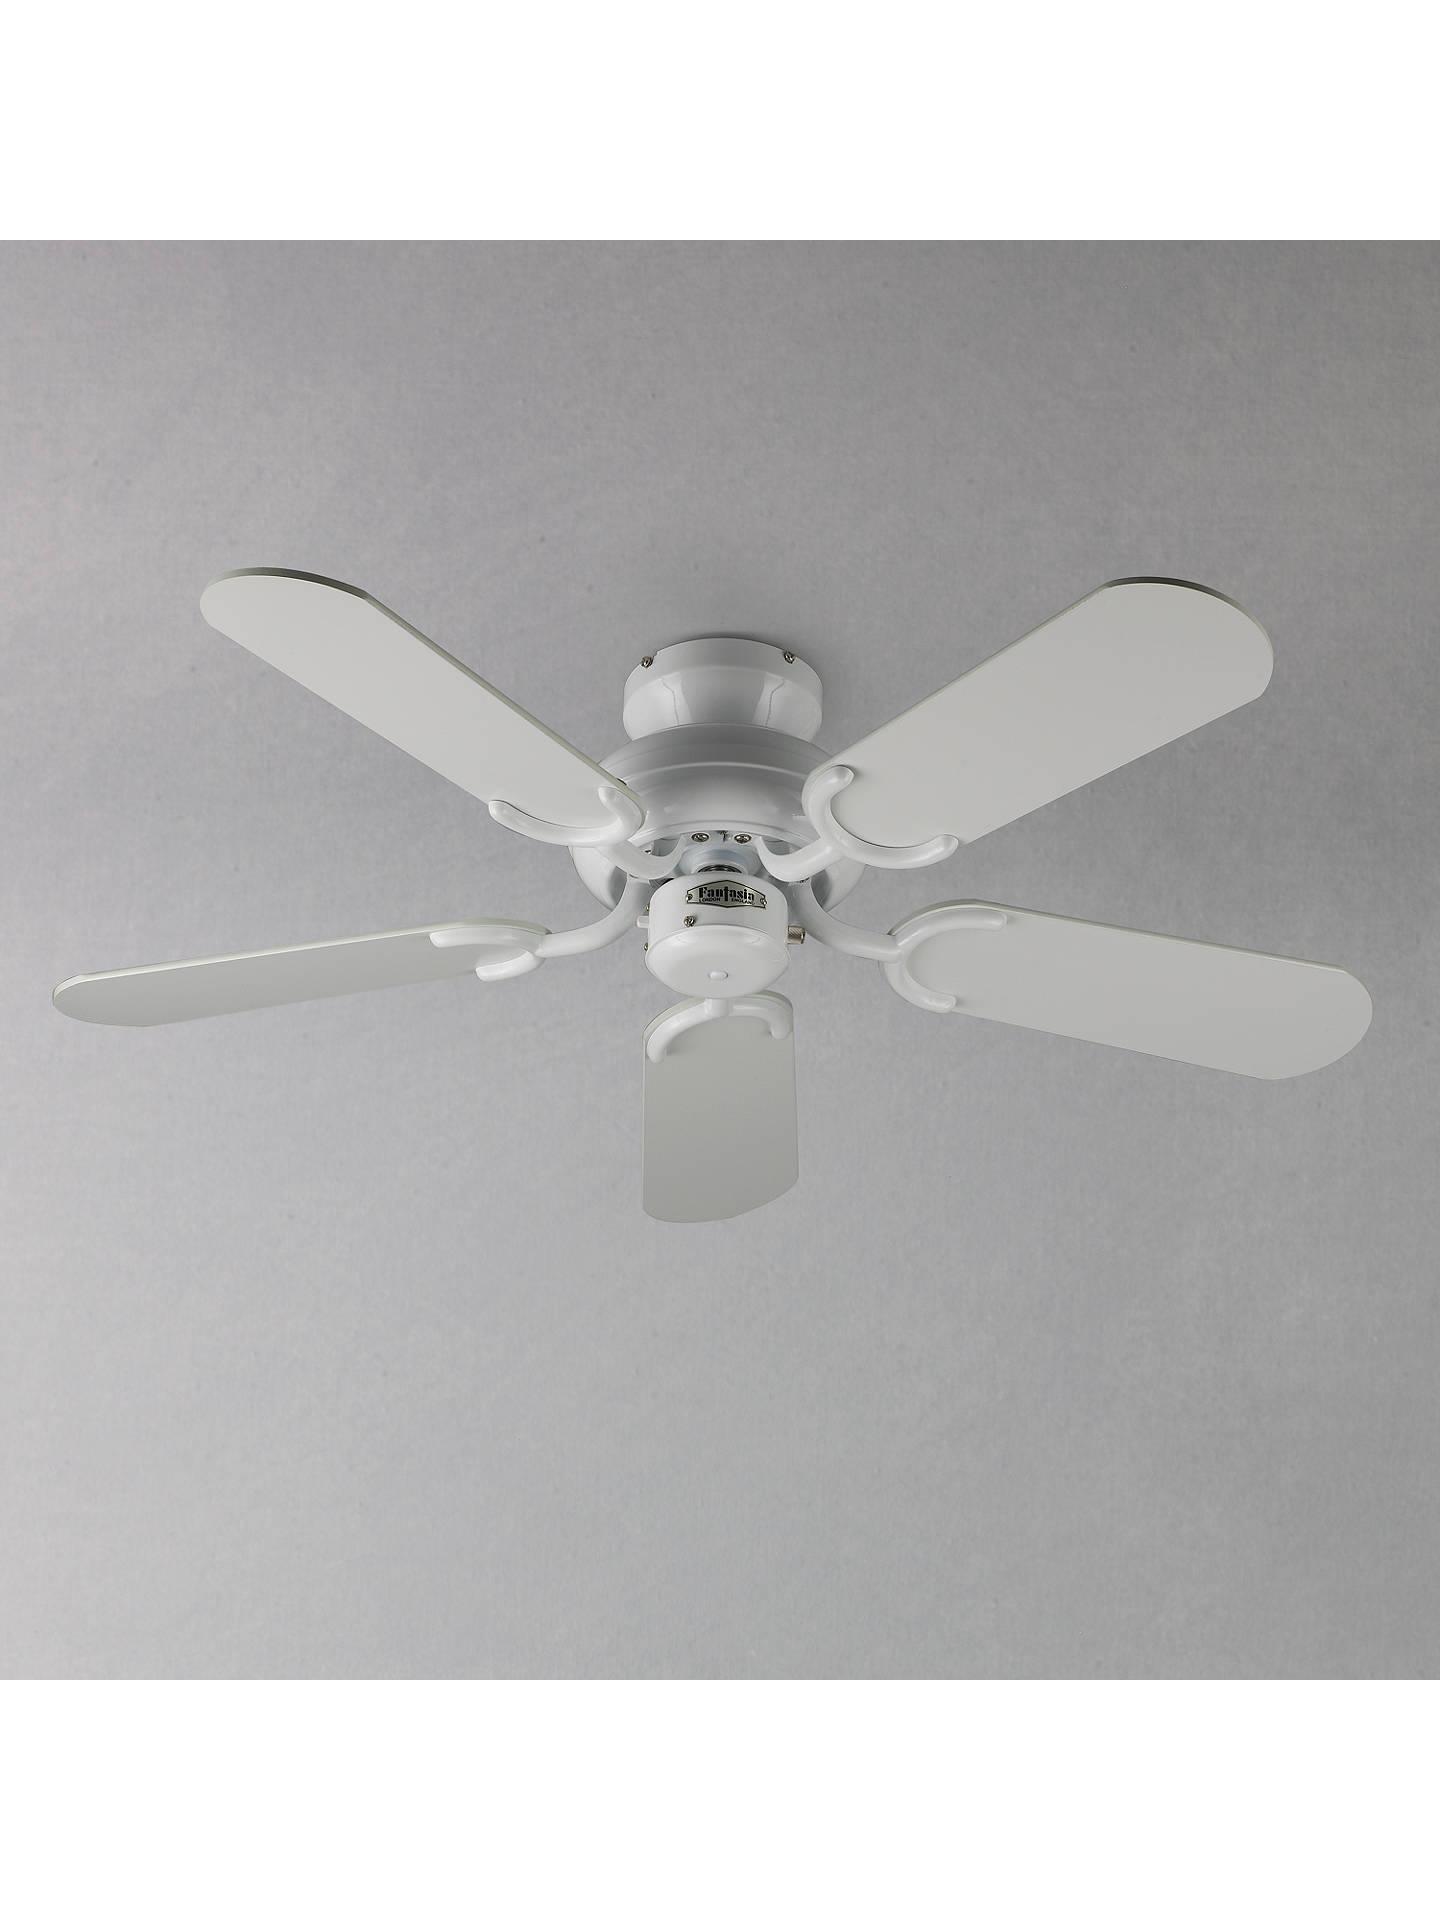 fantasia capri ceiling fan white at john lewis partners. Black Bedroom Furniture Sets. Home Design Ideas